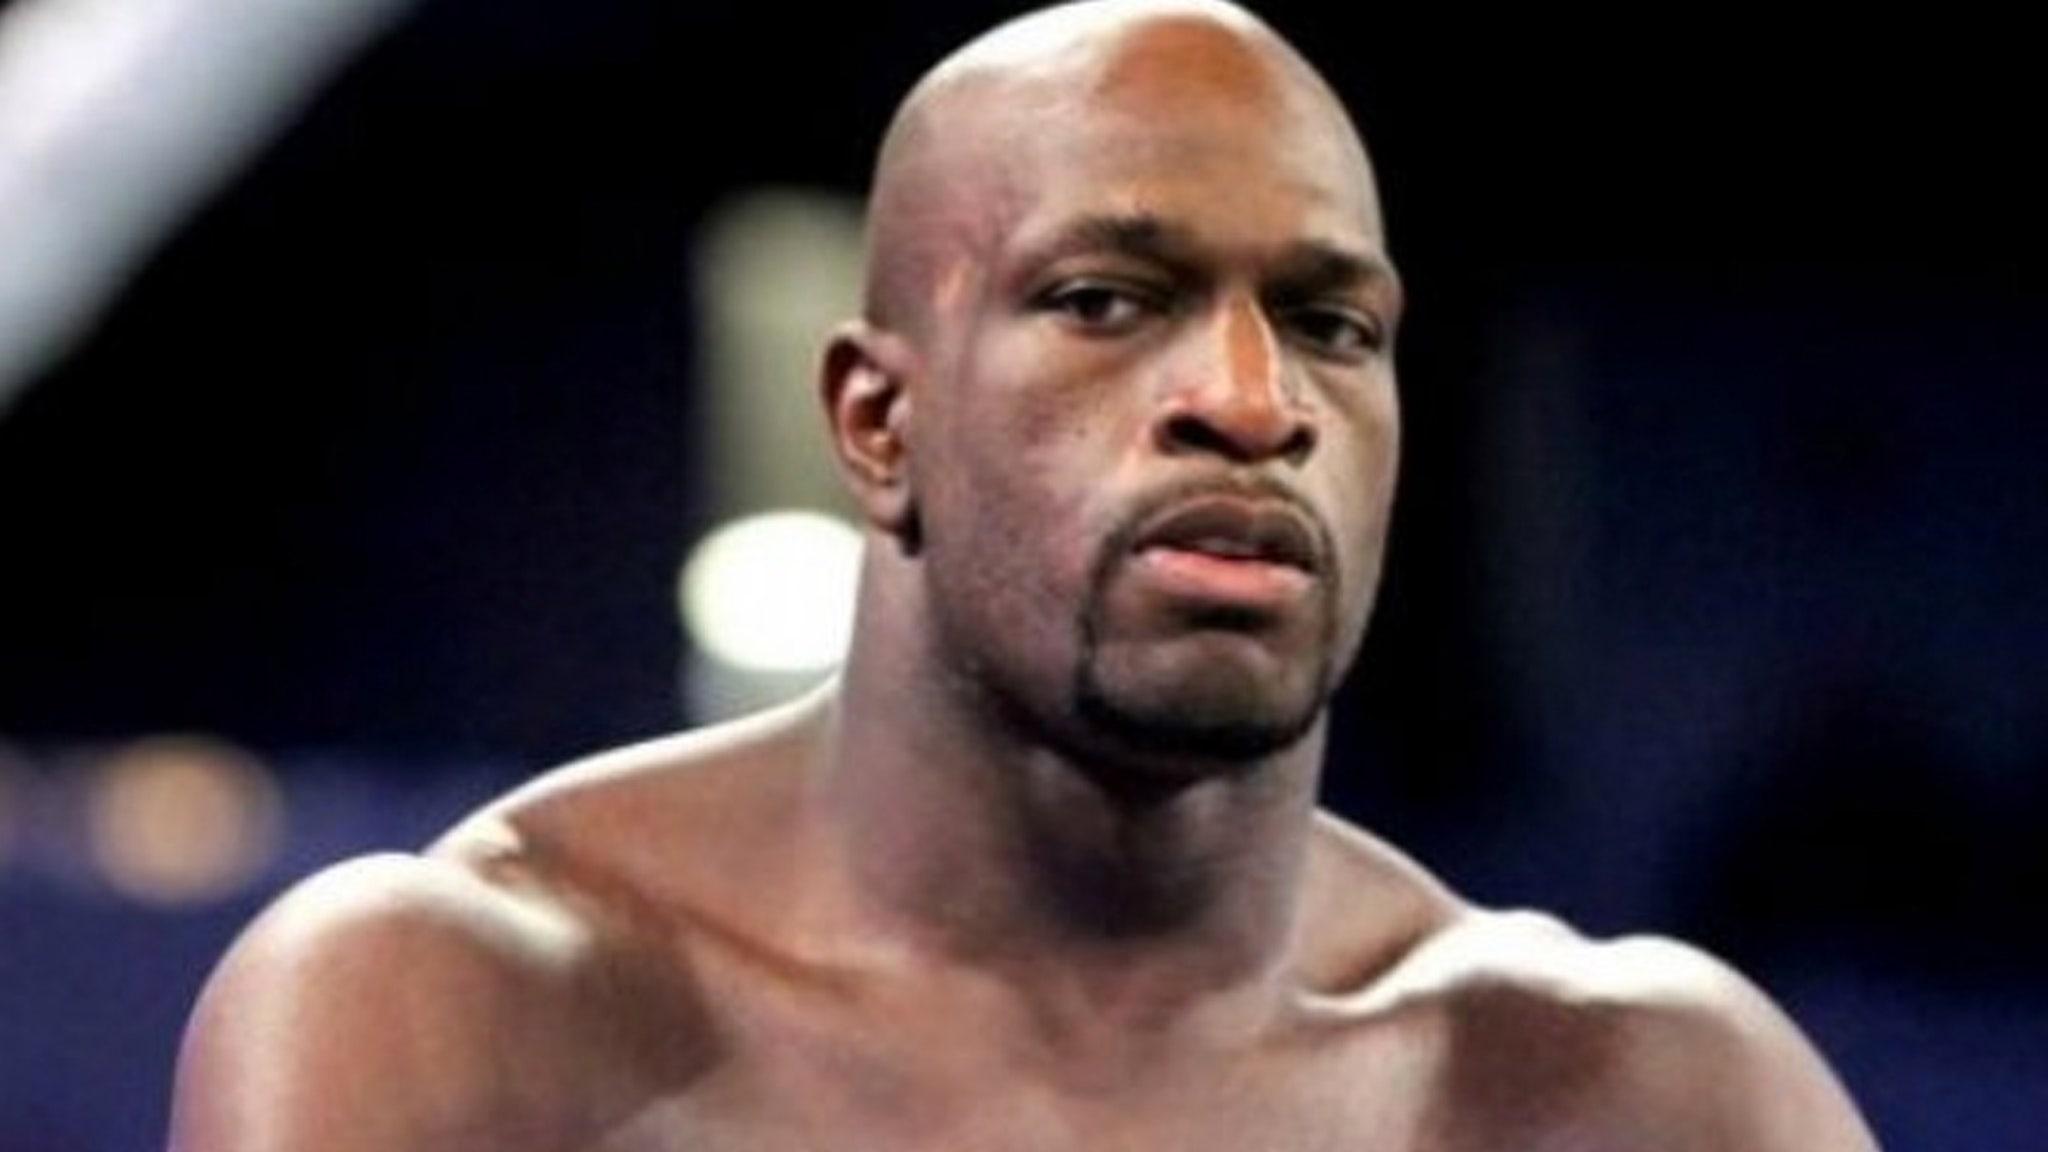 WWE's Titus O'Neil Emotional Over Floyd Killing, How Do I Explain to My Kids?